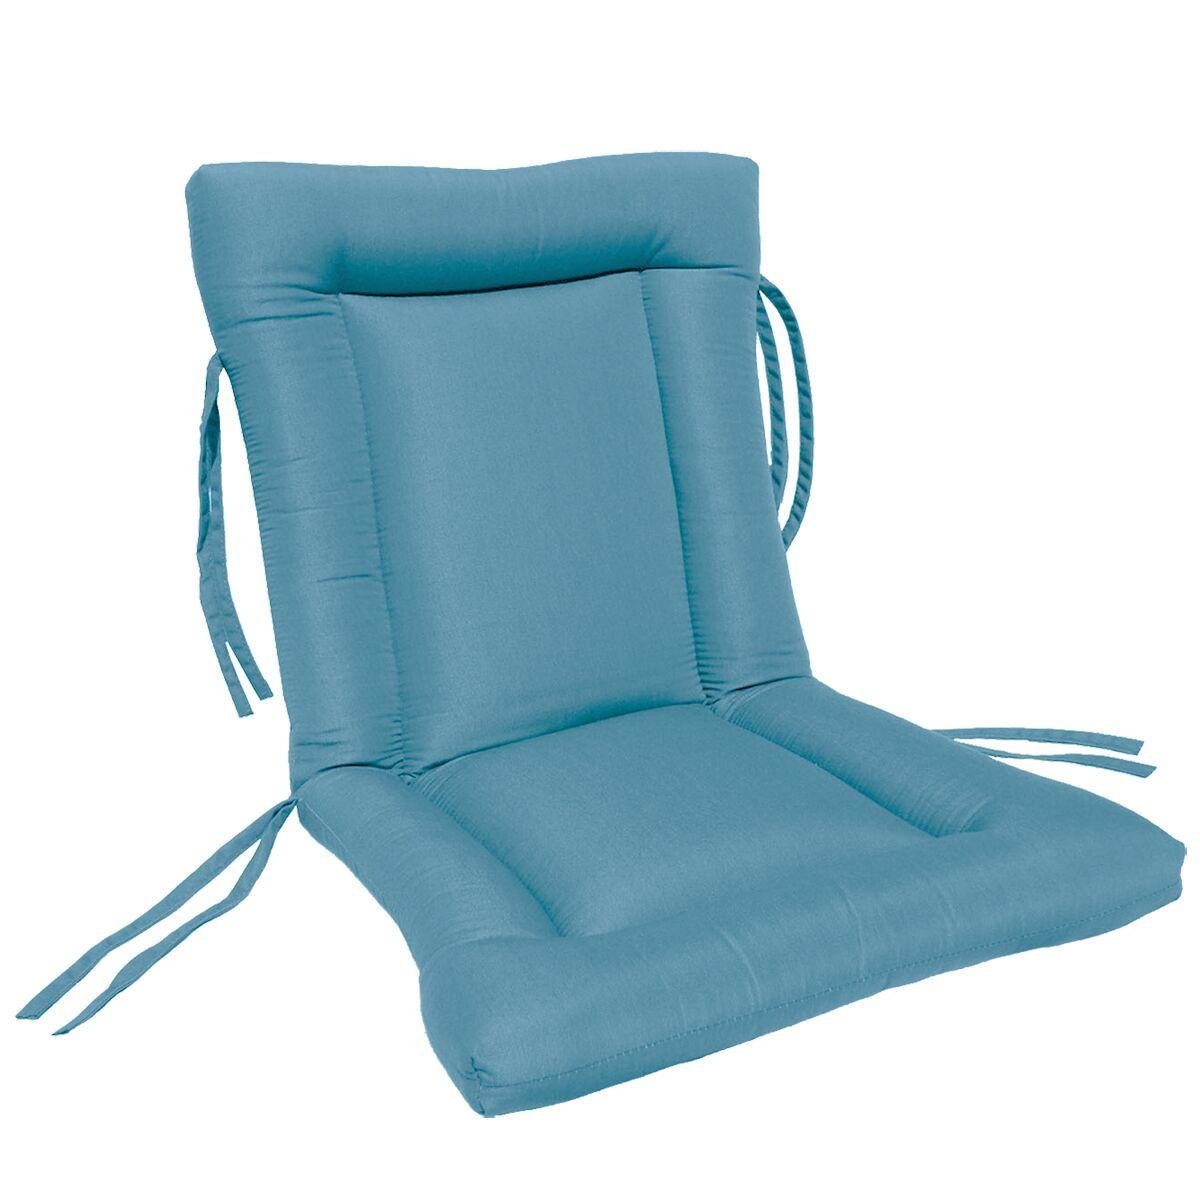 European Quilt Indoor/Outdoor Sunbrella Chair Cushion Fabric: Sky Blue